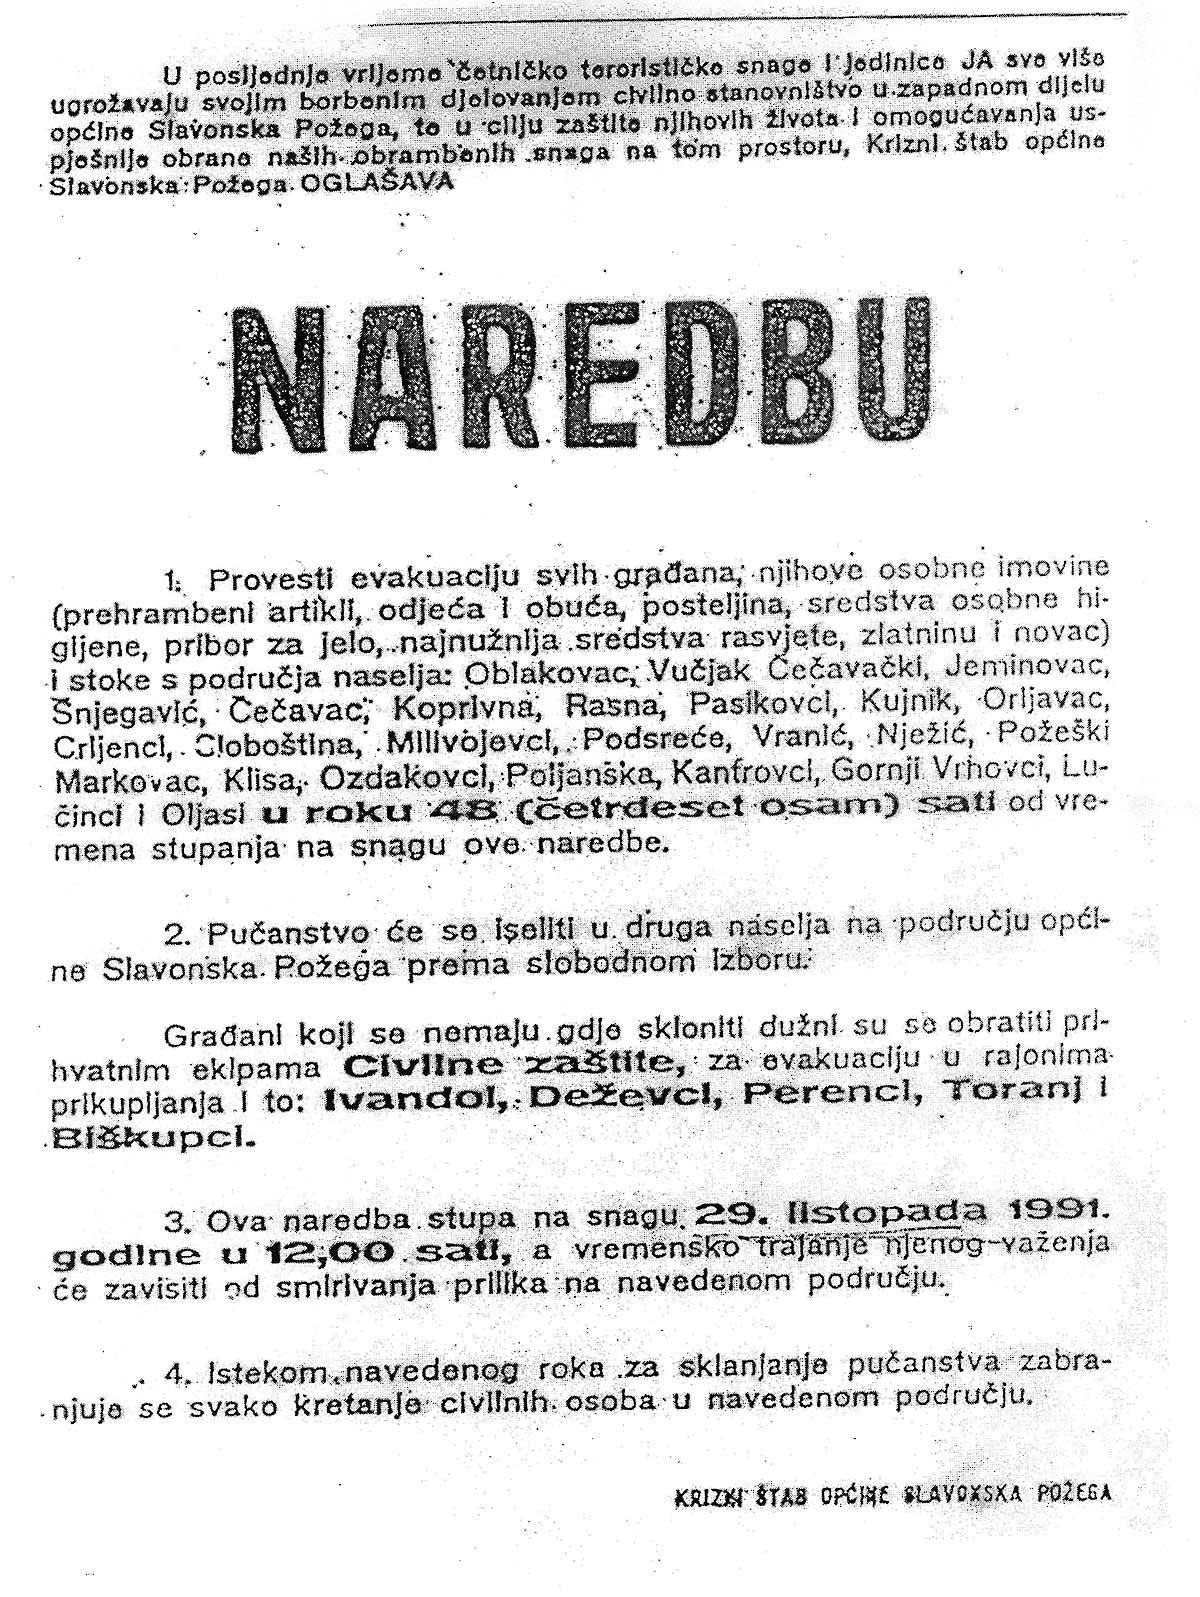 Naredba o evakuaciji od 28. listopada 1991,  Slavonska Pozega  - kliknuti za uvećanje Foto: Arhiva DIC Veritas